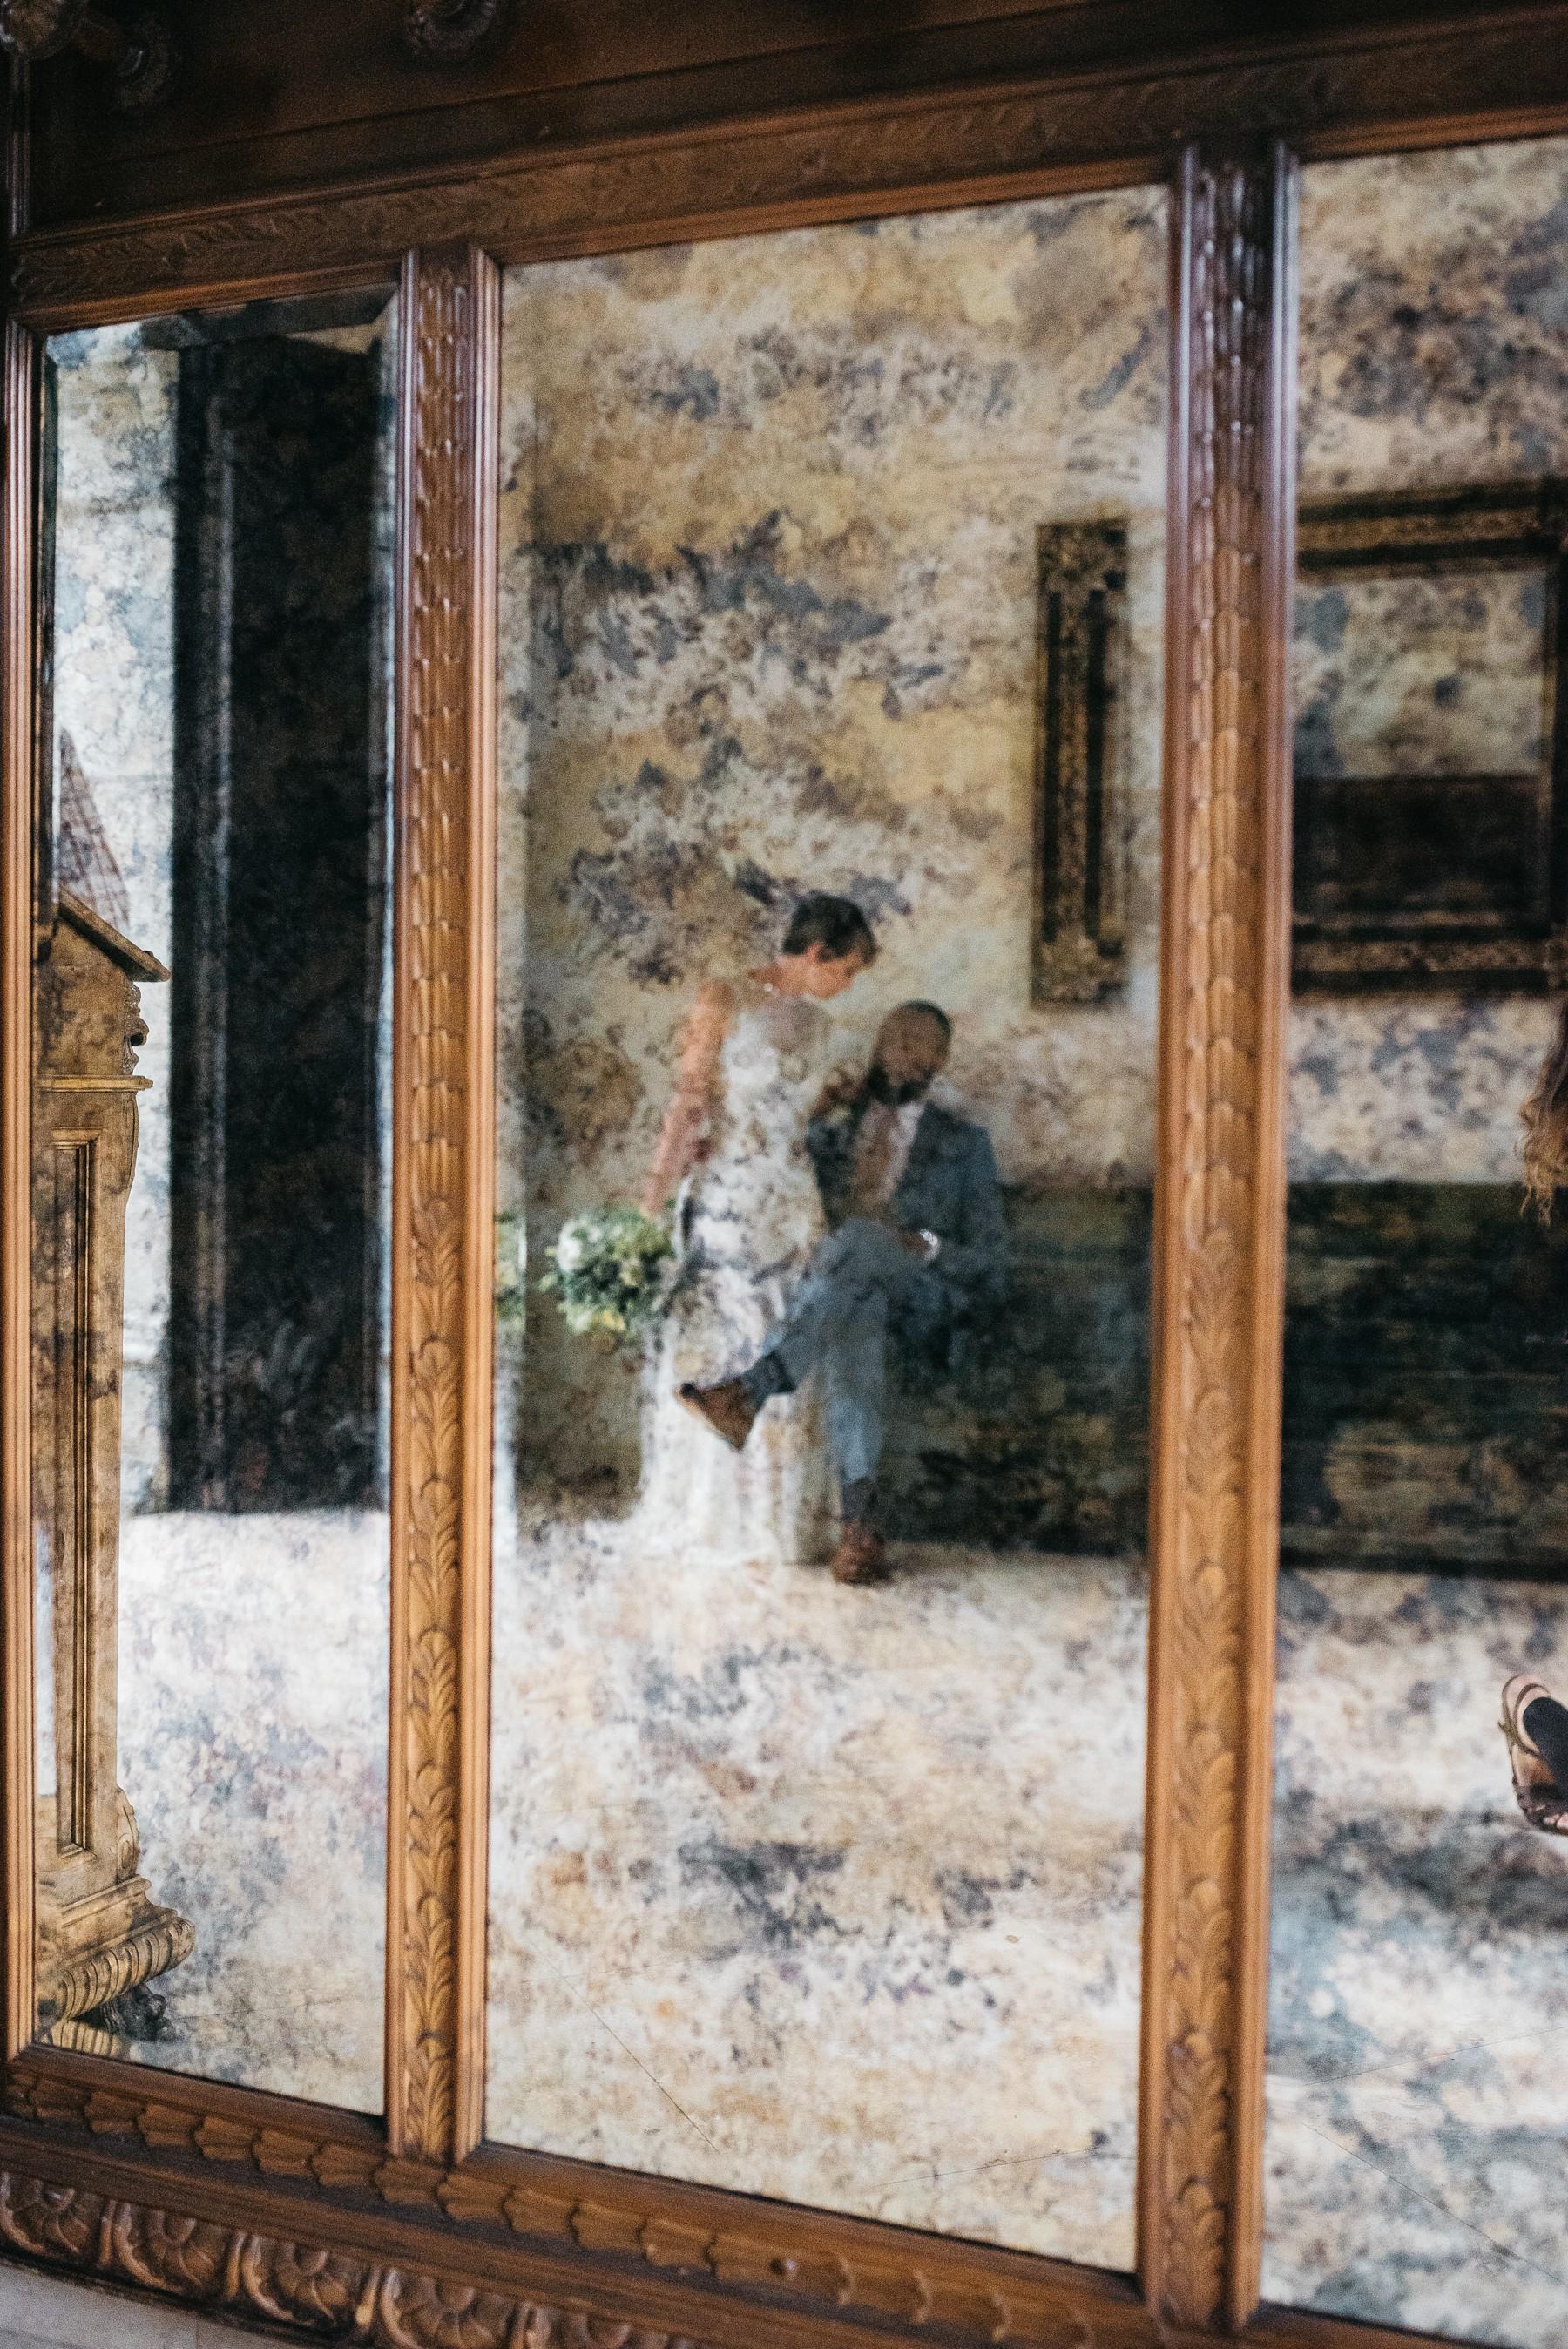 Wedding Photo Mirror Reflection